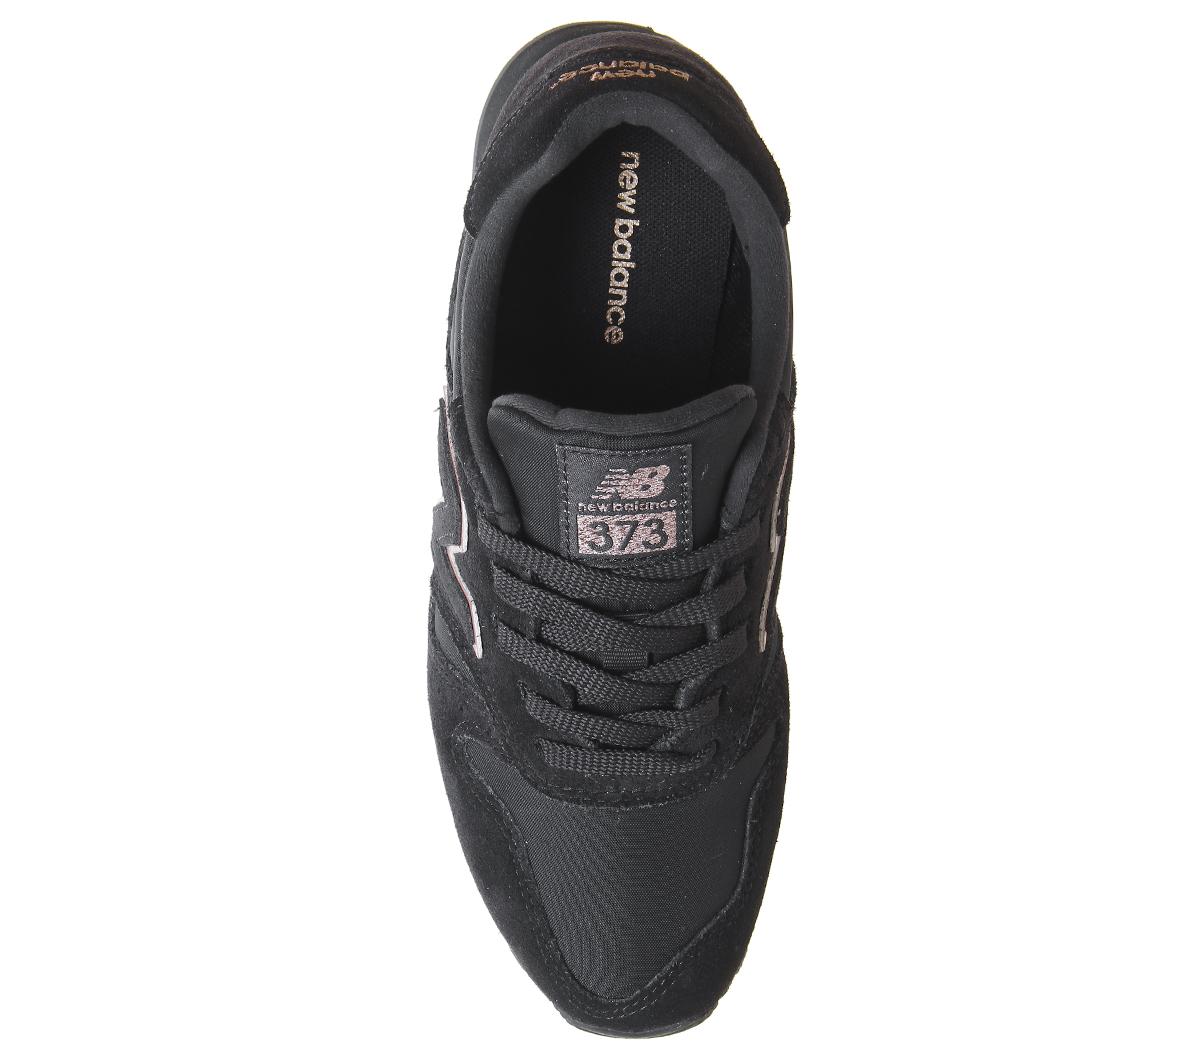 Phantom mujer zapatos para Gold Zapatillas Rose deportivas Wl373 New Balance exclusivos YwqgCx1TO